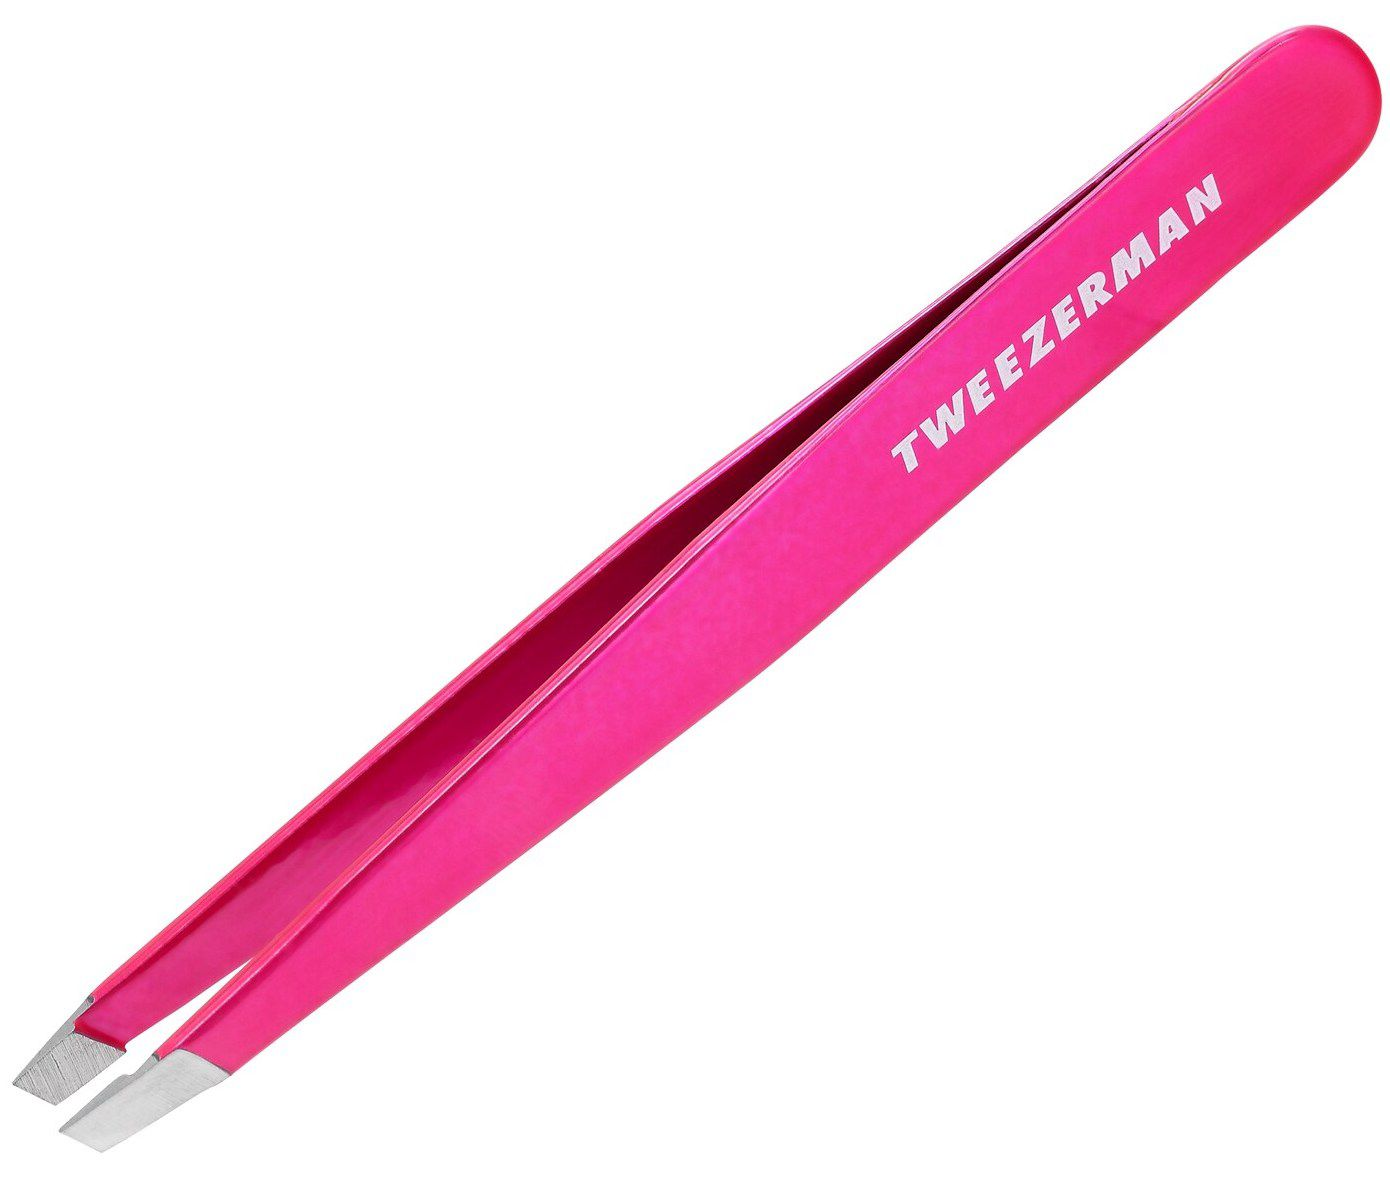 tweezerman pink